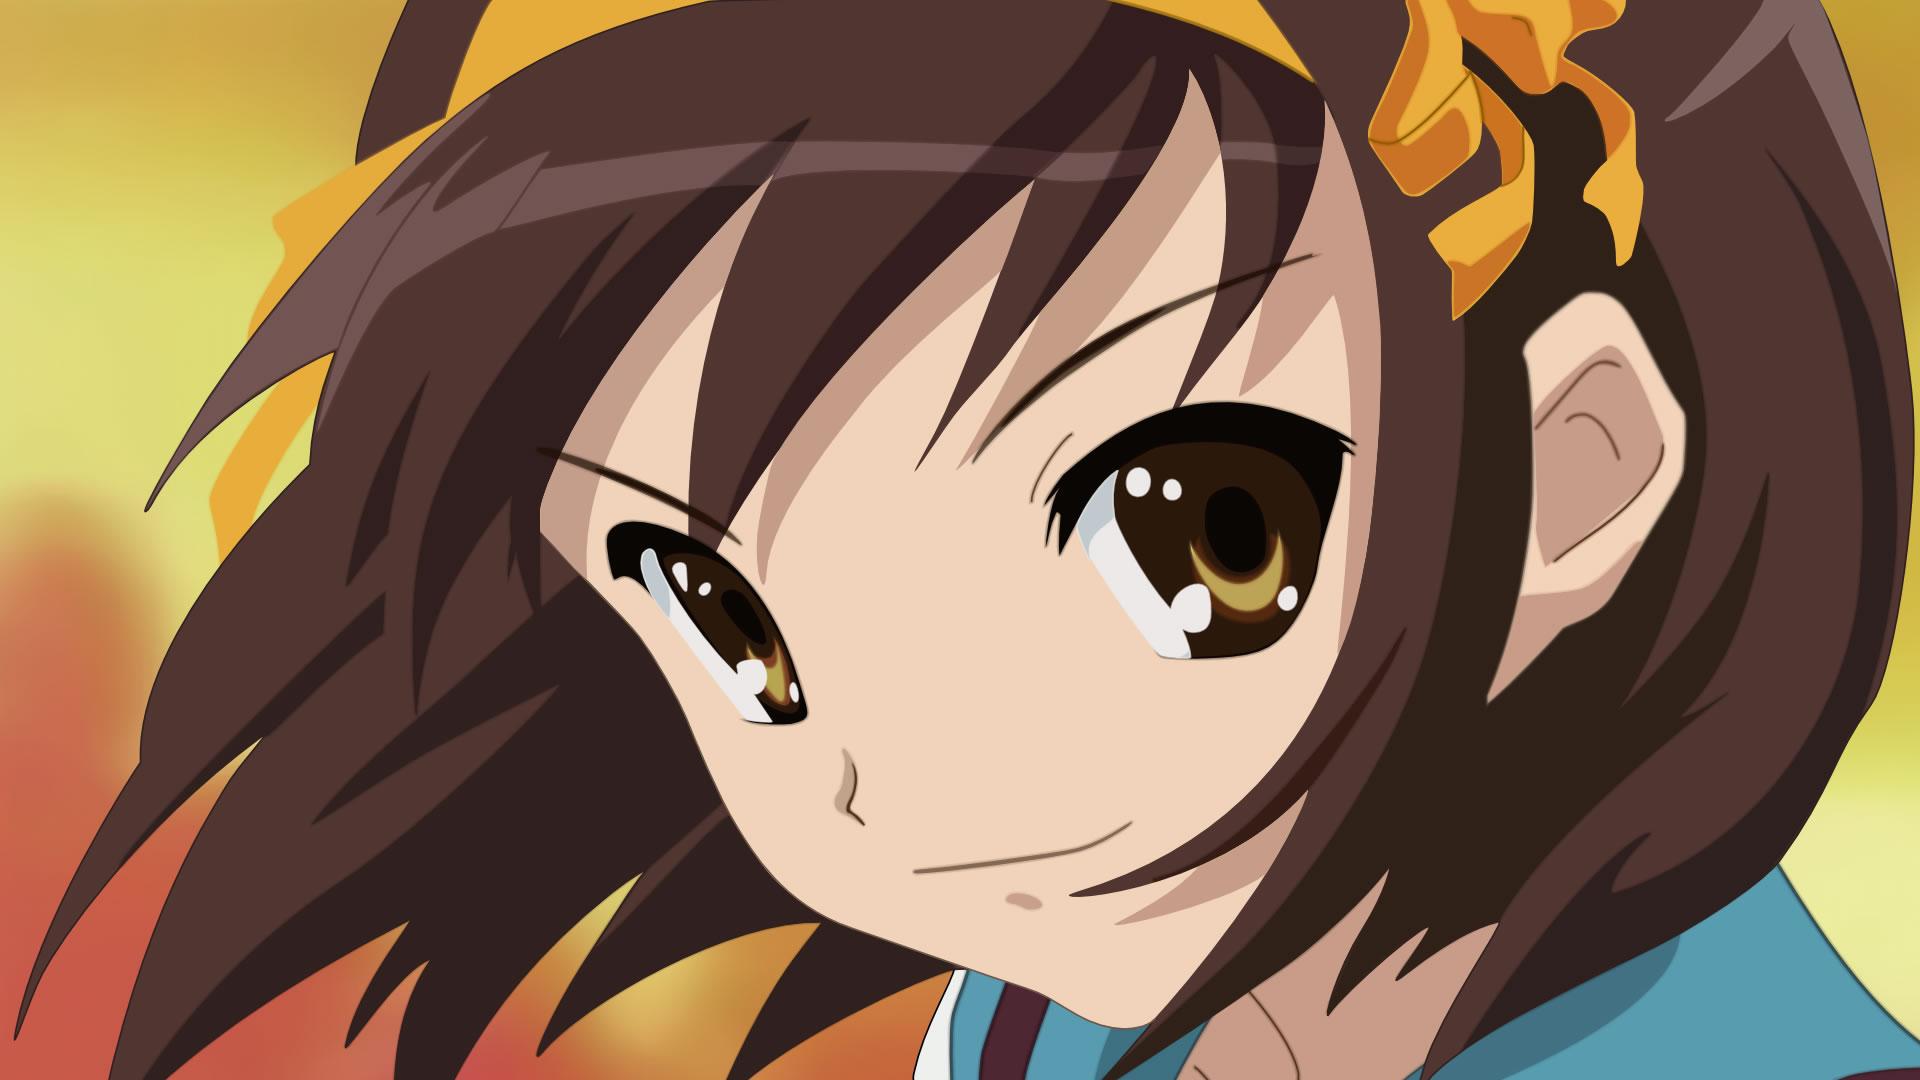 The Melancholy of Haruhi Suzumiya